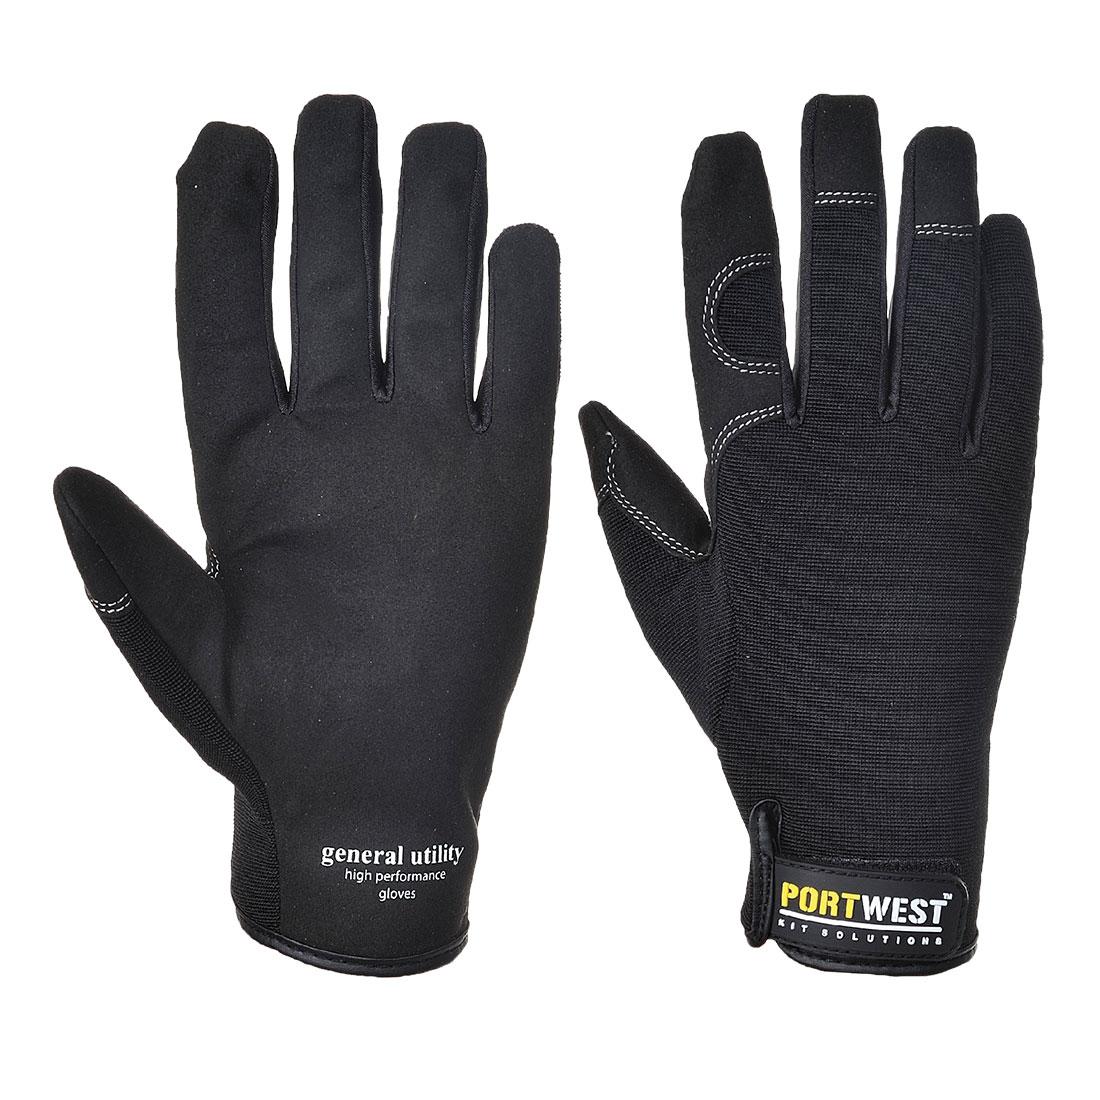 Portwest General Utility High Performance Glove - A700